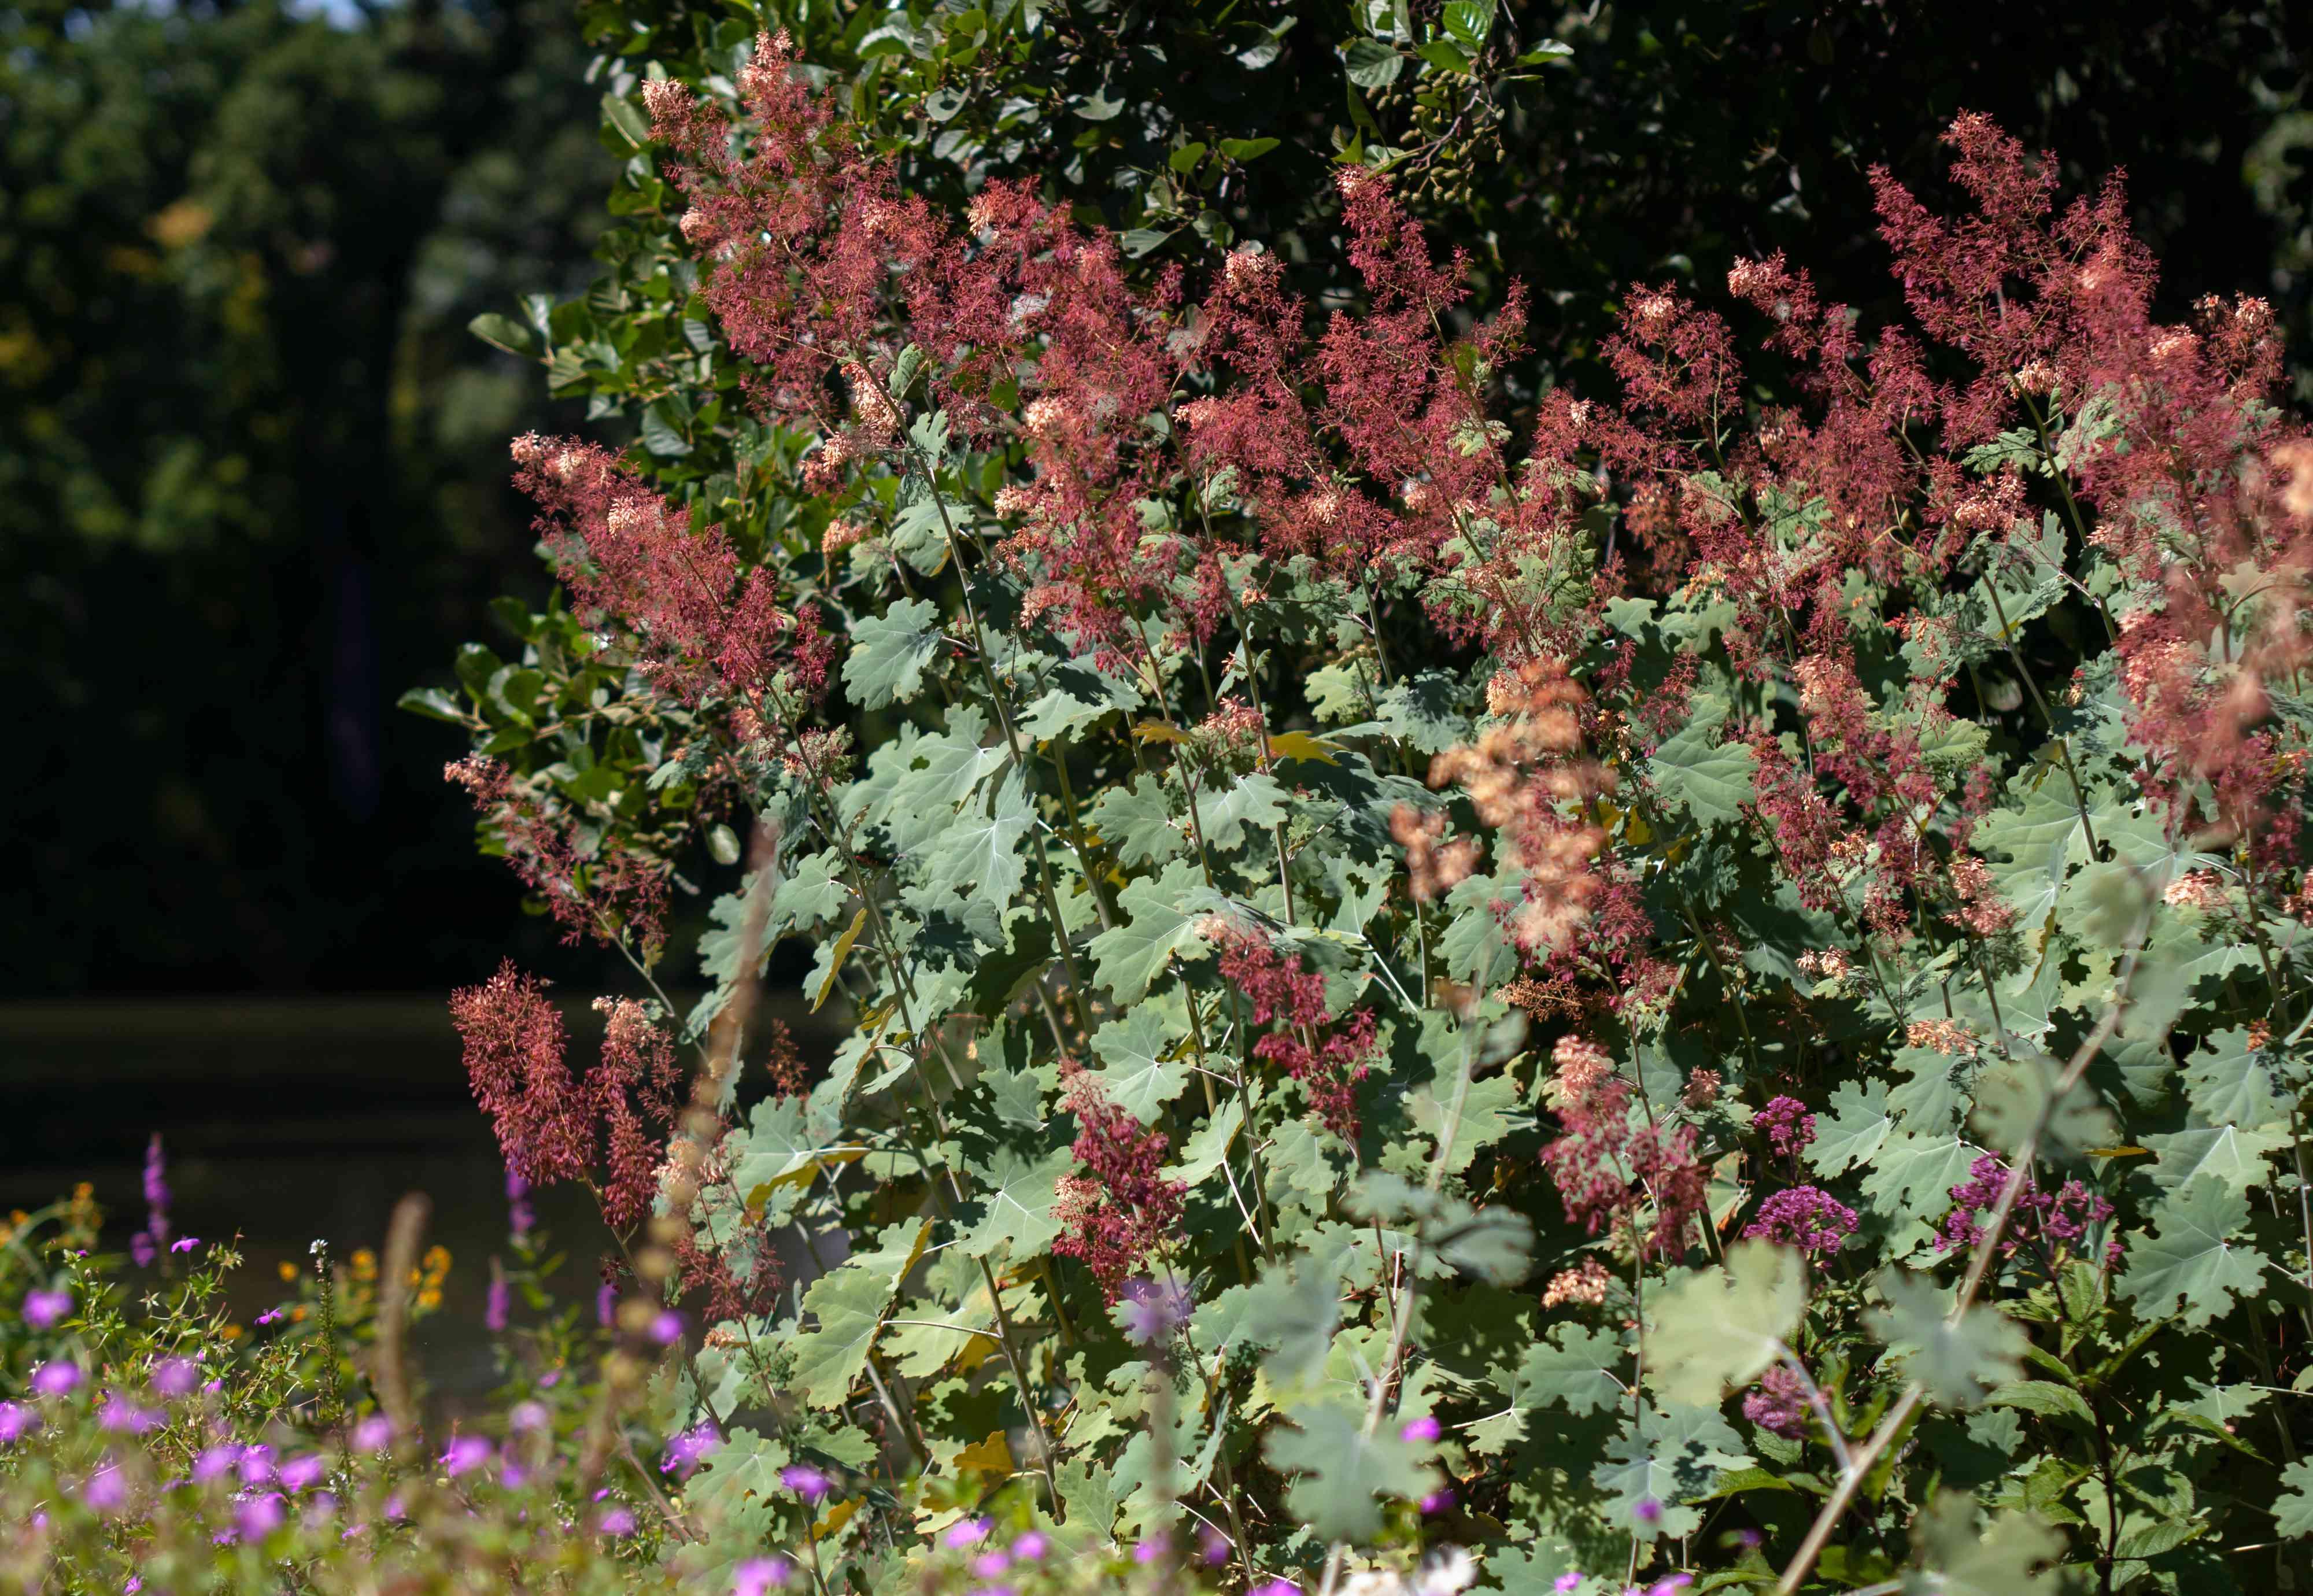 Plume poppy shrub with red flowers in garden